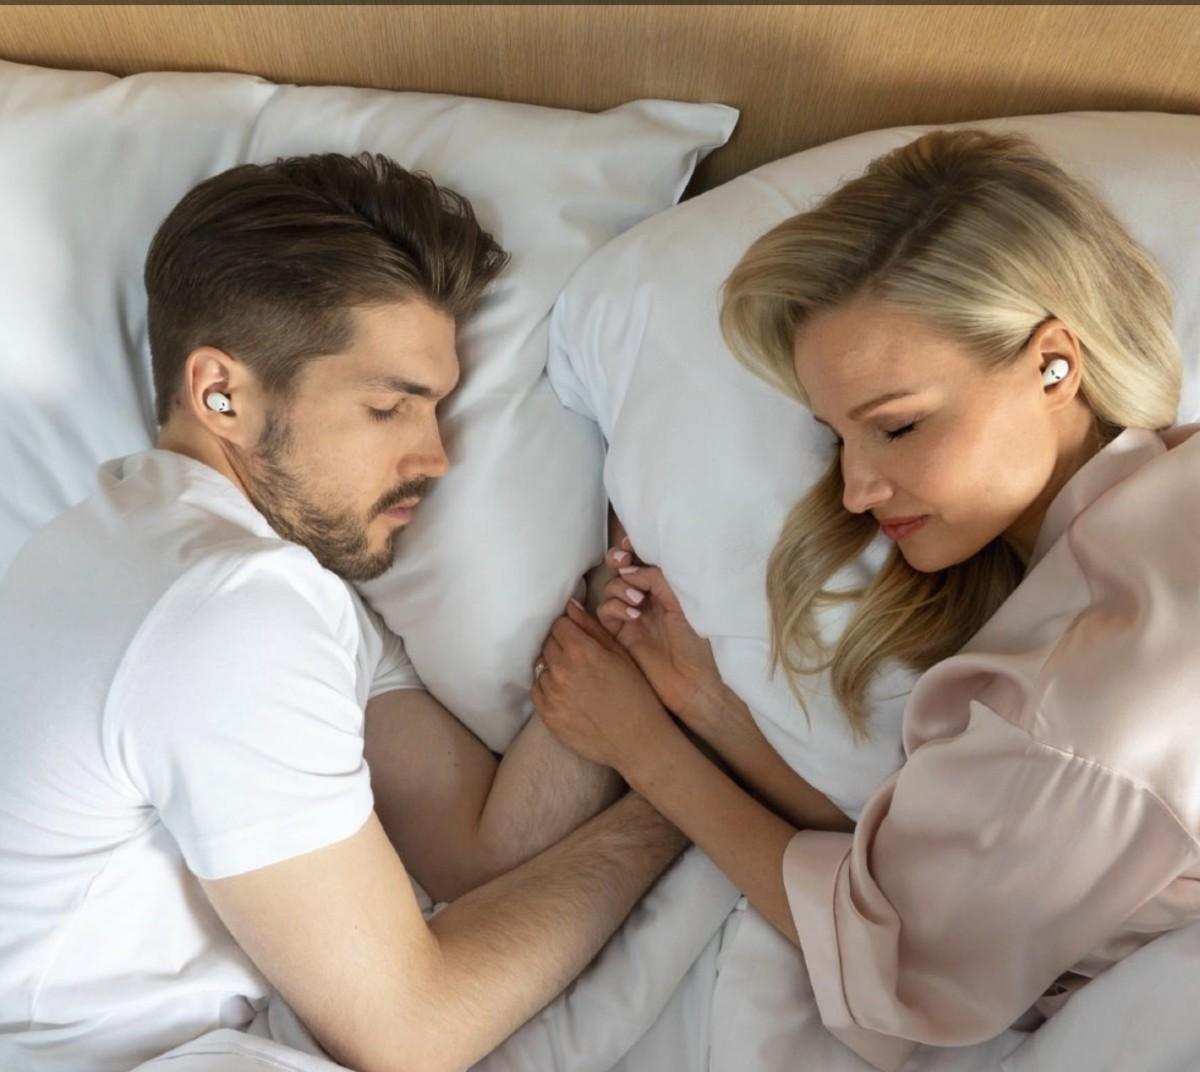 the-quieton-3-sleep-earbuds-help-you-sleep